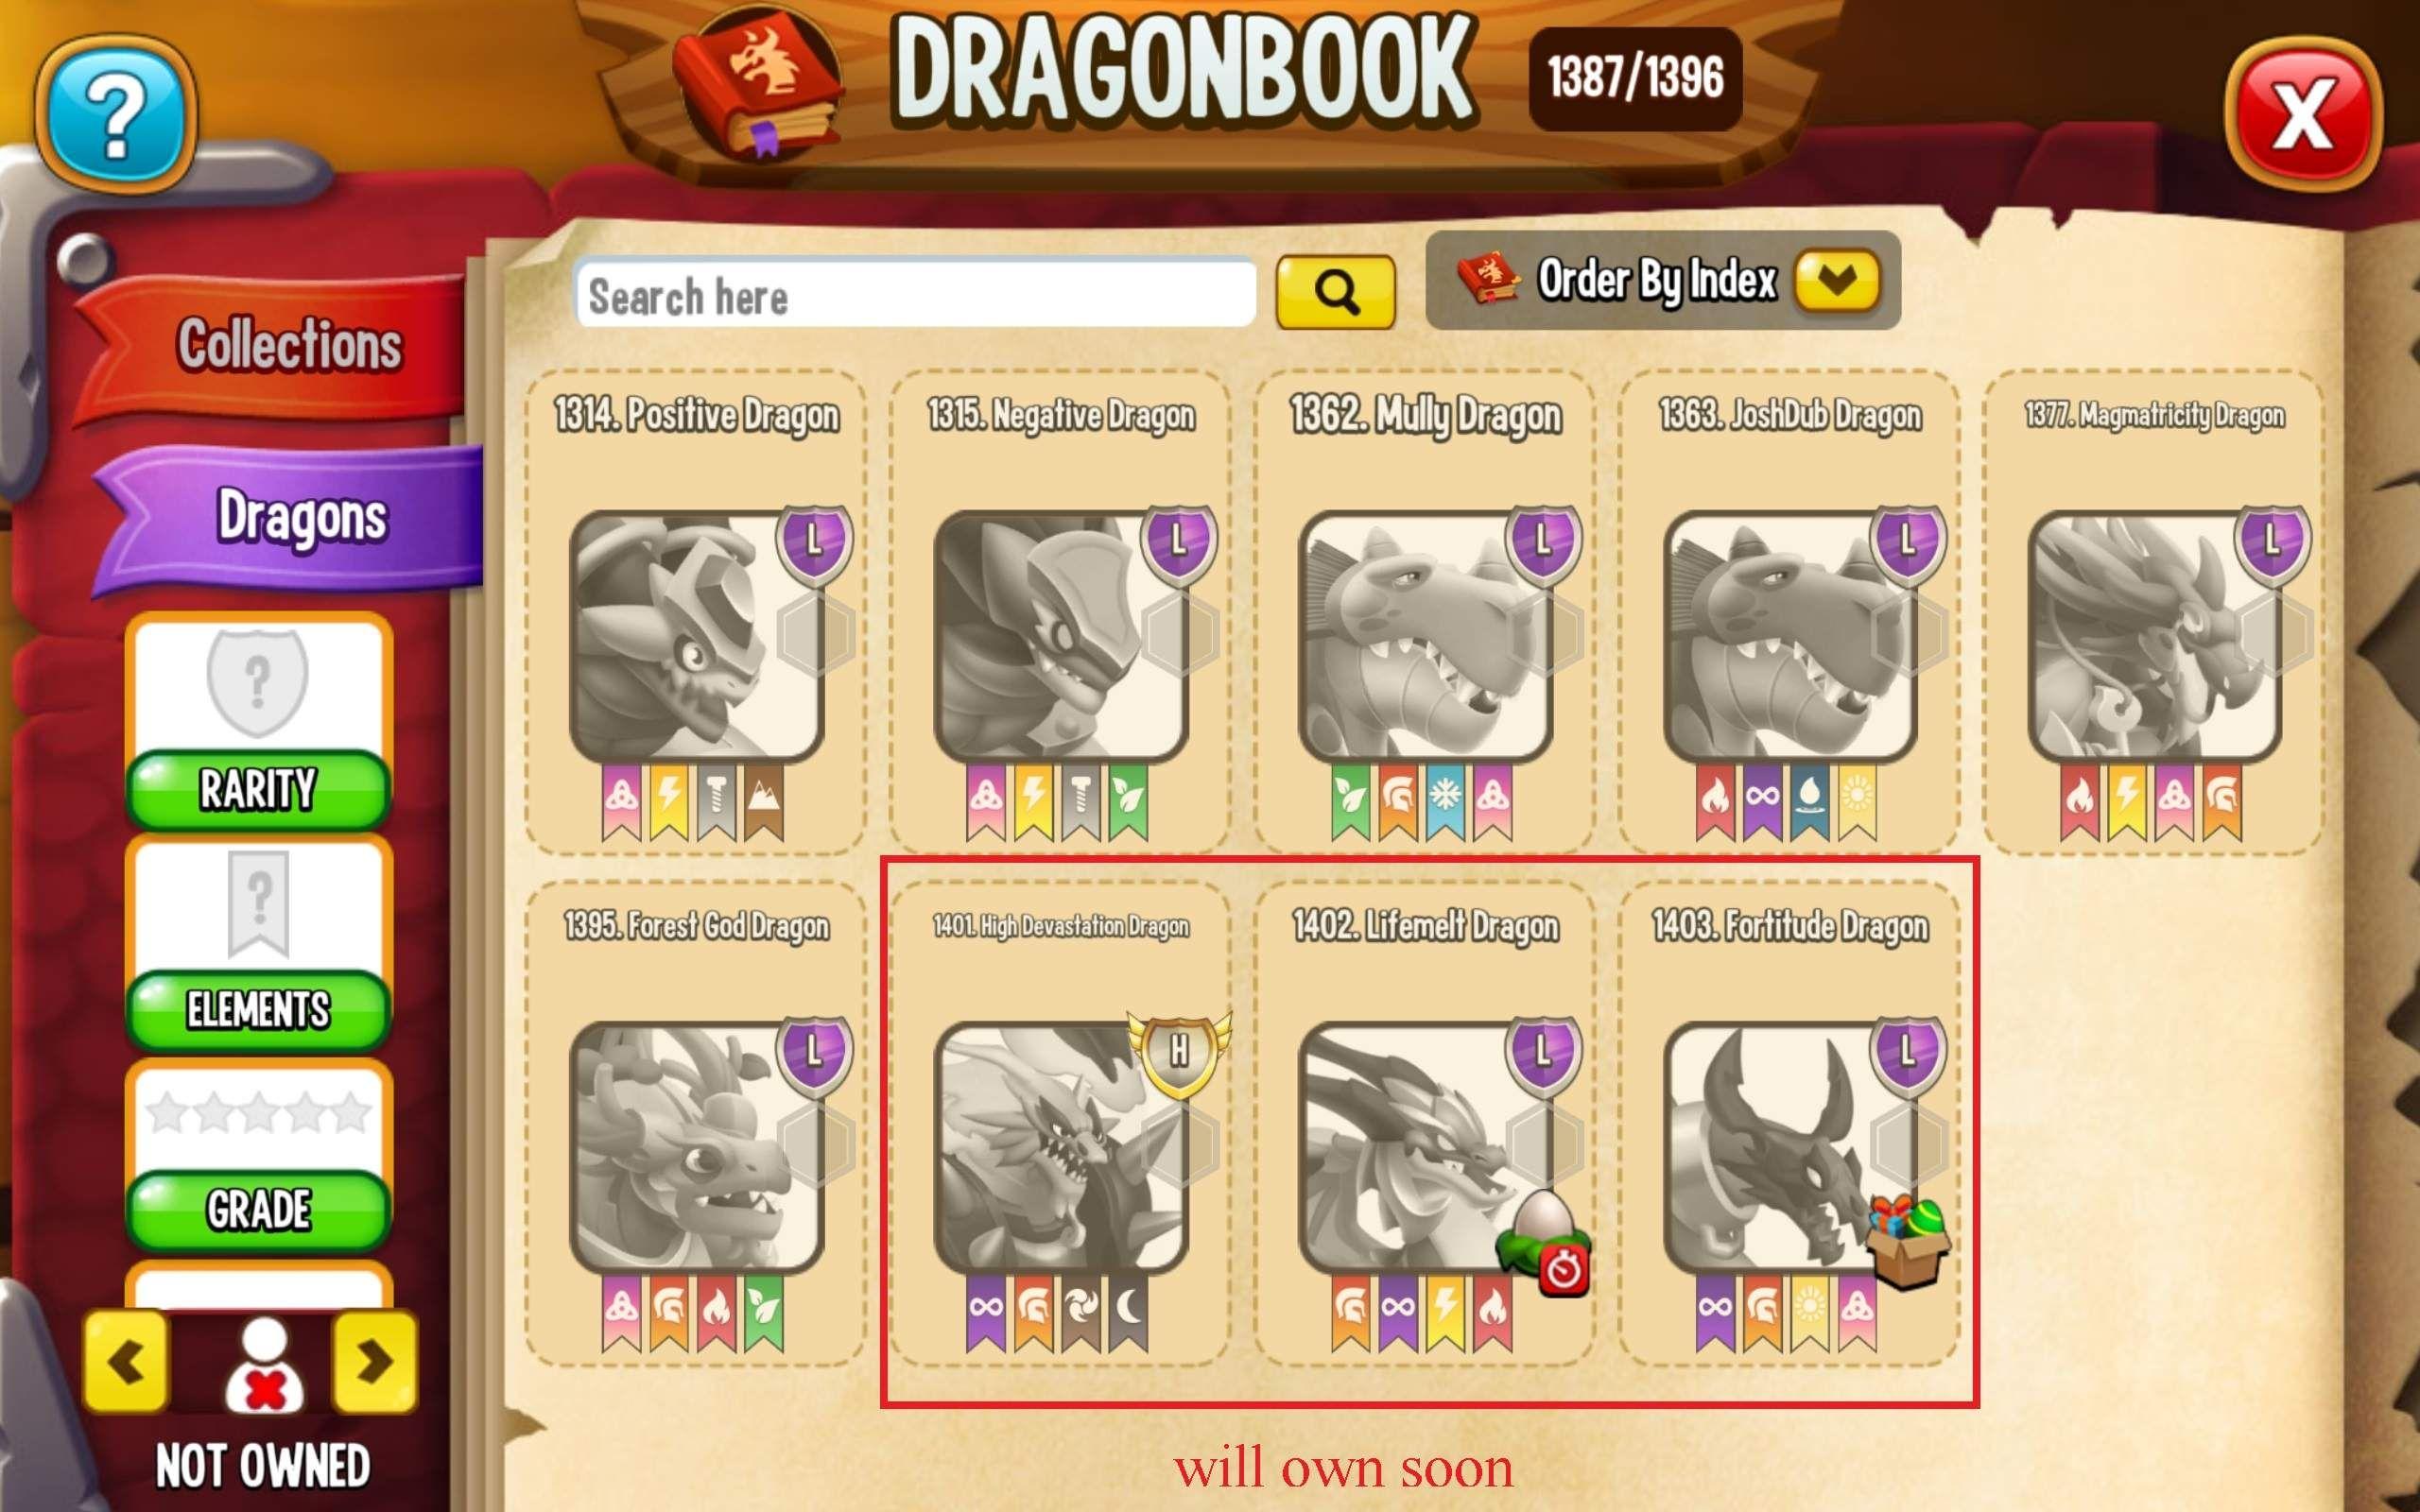 0_1602186370205_100820 unowned dragons.jpg